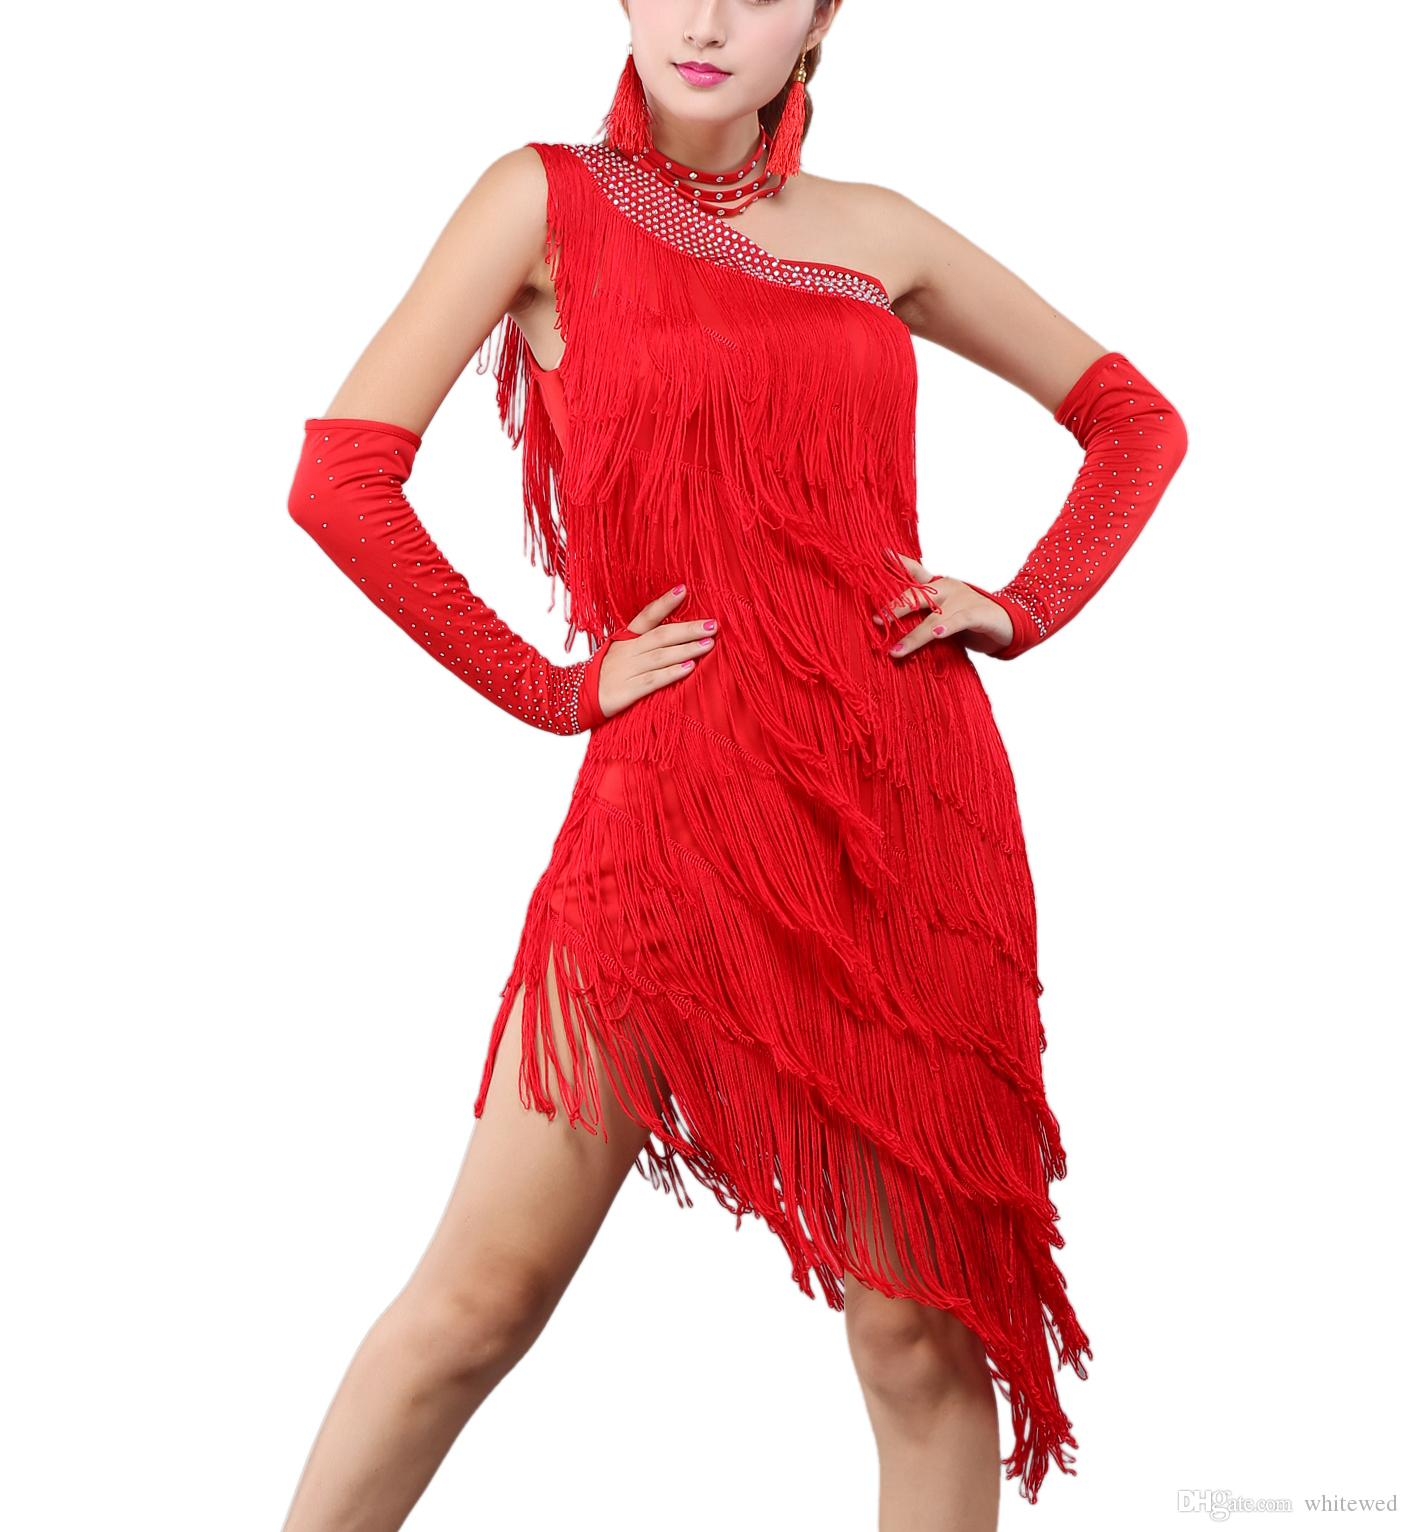 Whitewed One Shoulder Fringed Gatsby Event Latin Dance Costumes Dresses Latino Latin Ballroom Dance Team Practice Dancewear Costumes Fashion